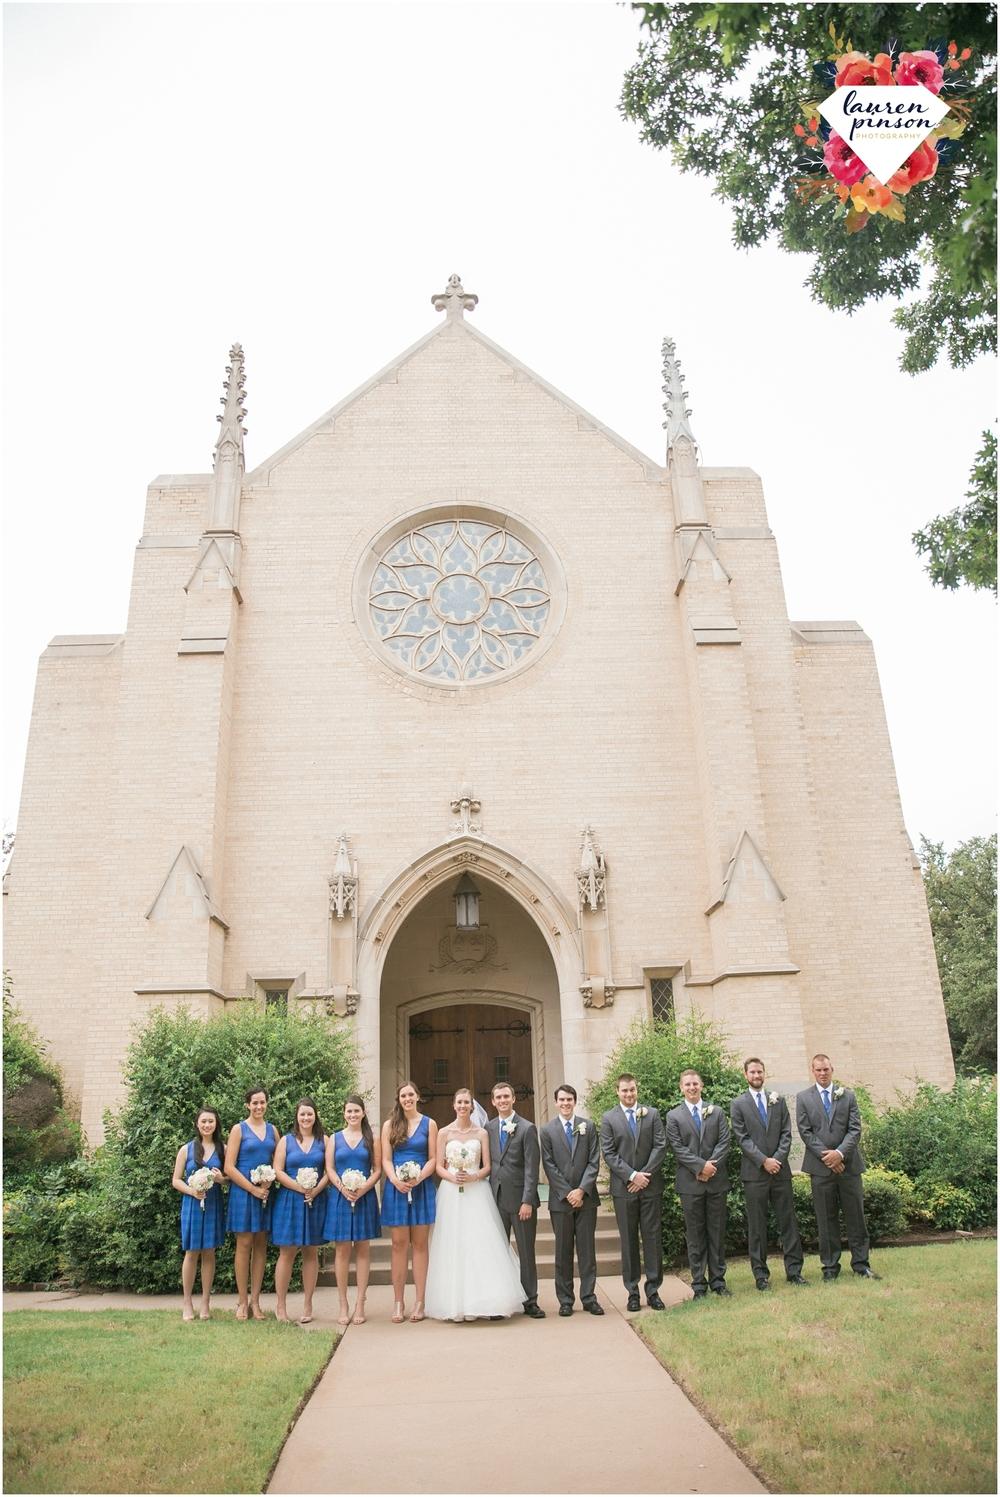 wichita-falls-wedding-photography-at-fain-presbyterian-church-and-the-wellington-timeless-classic-modern-photographer_1161.jpg